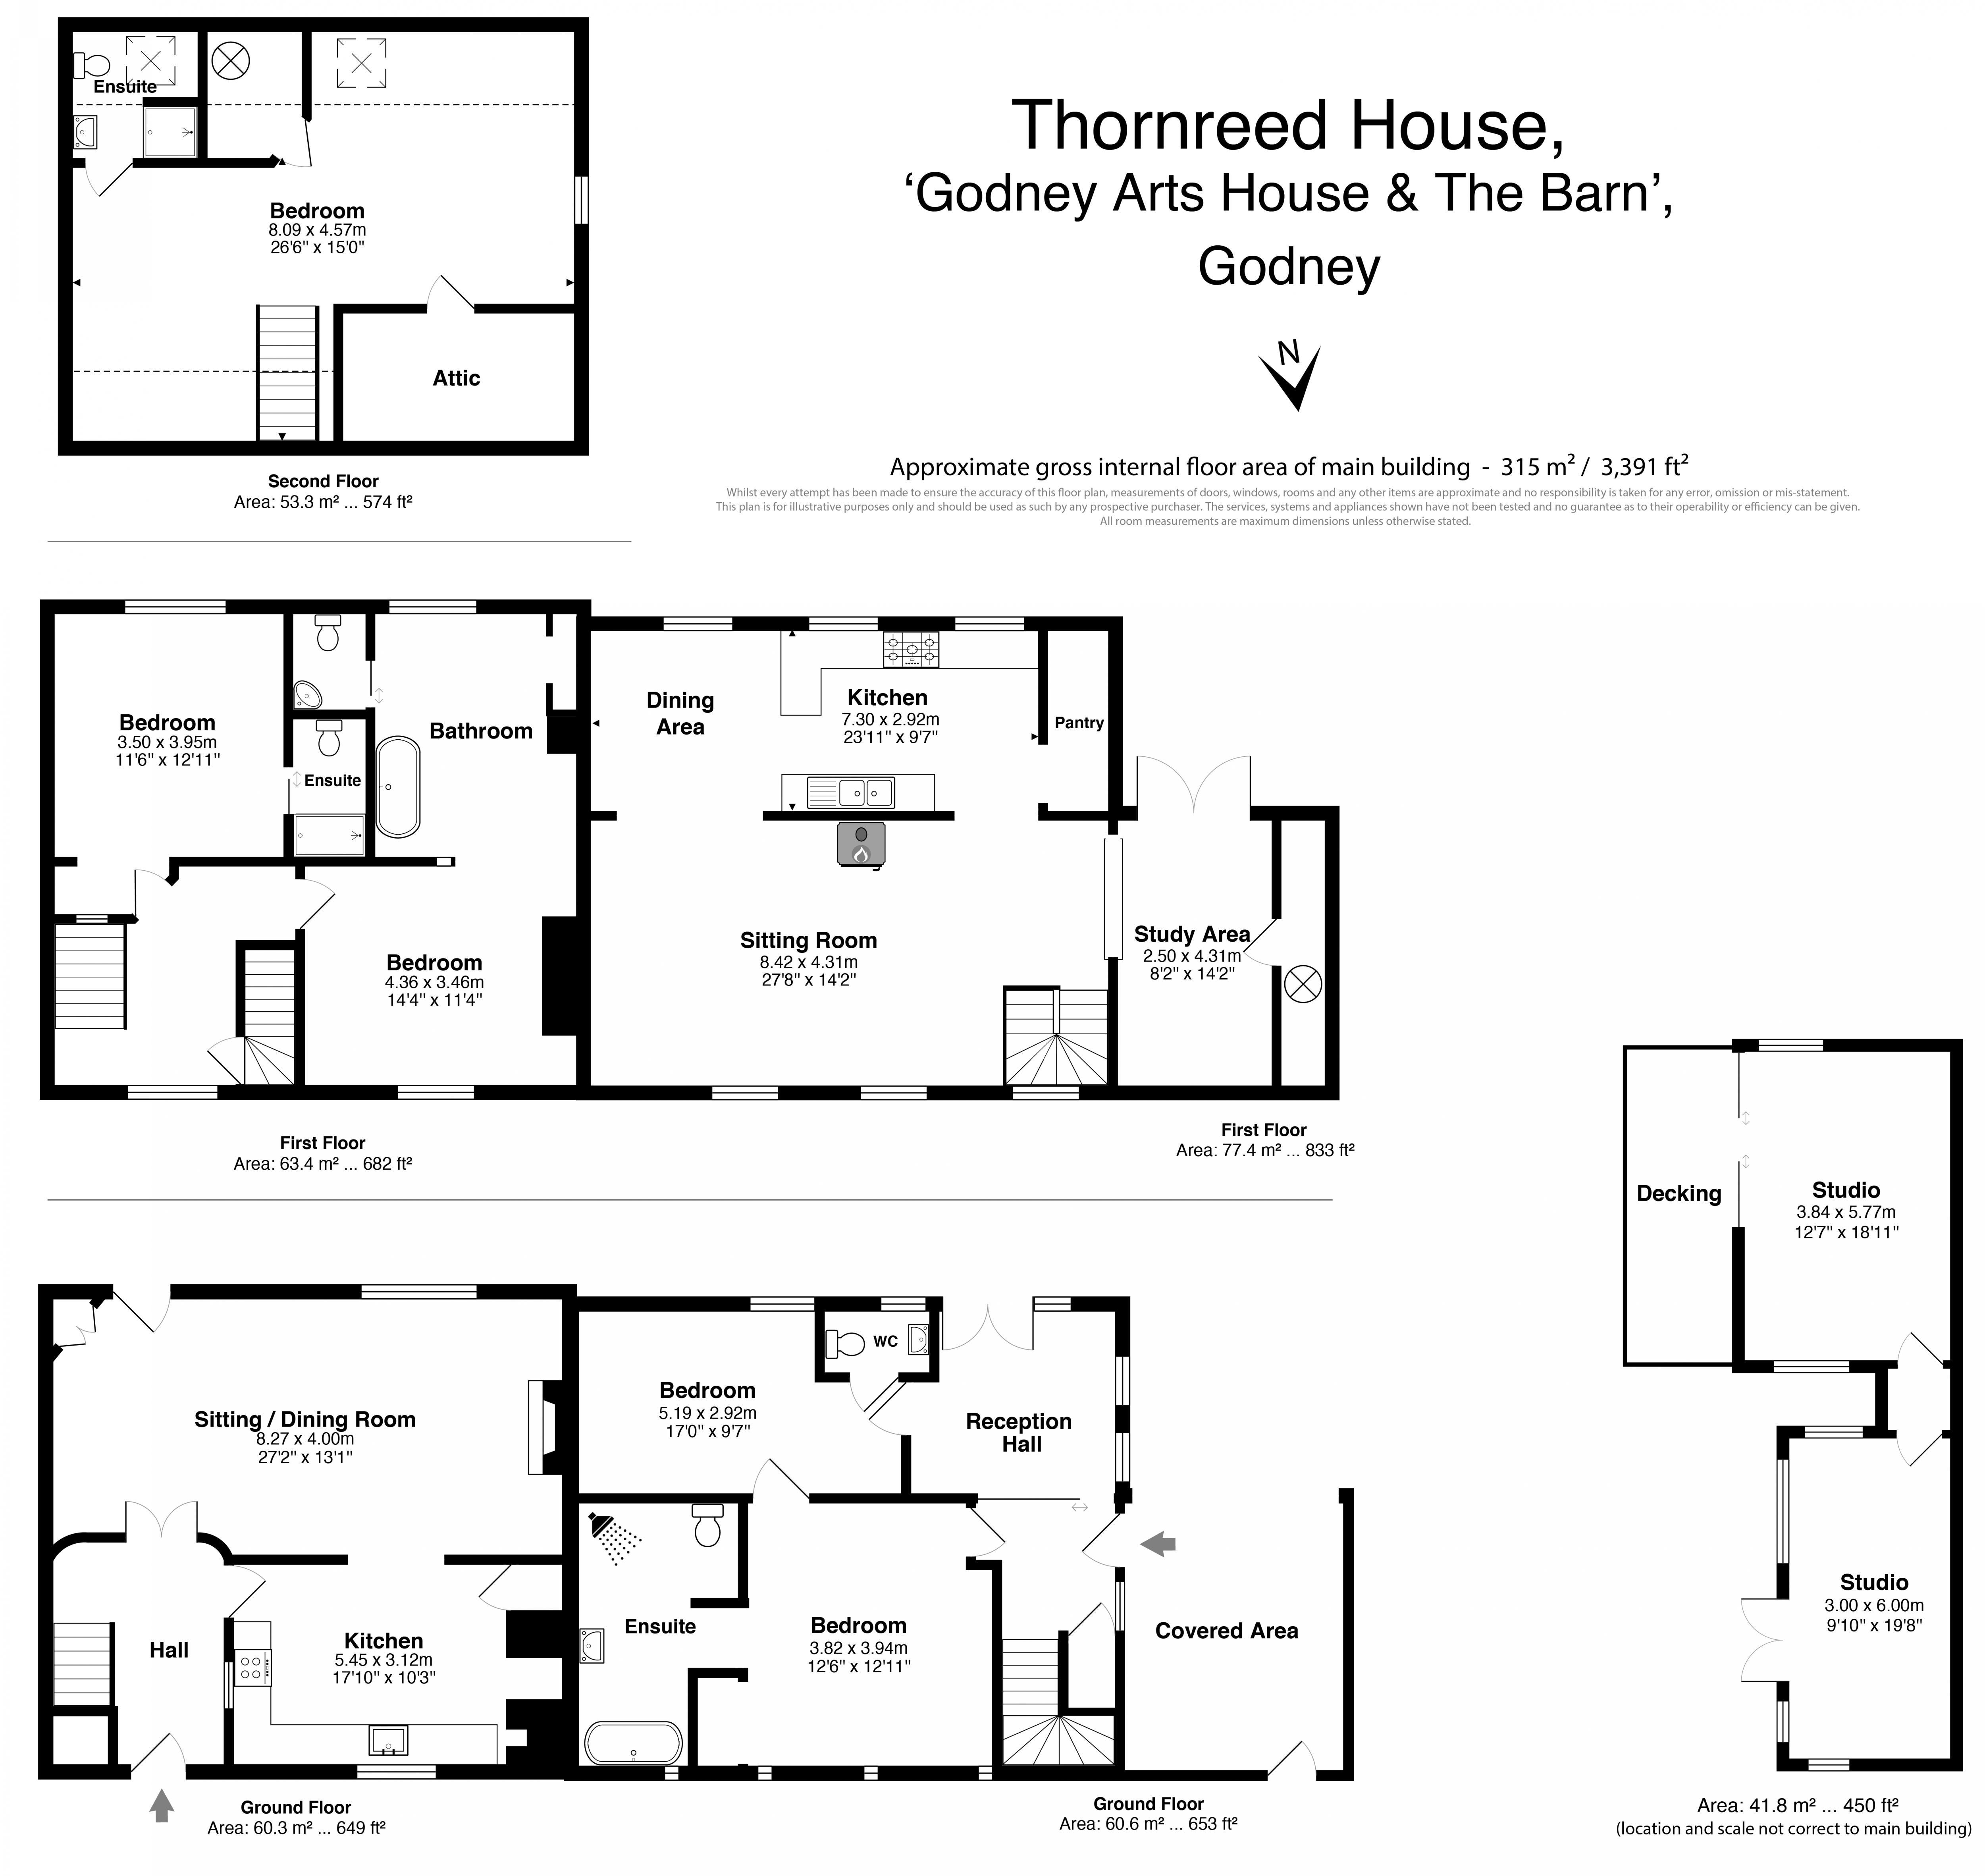 Thornreed House